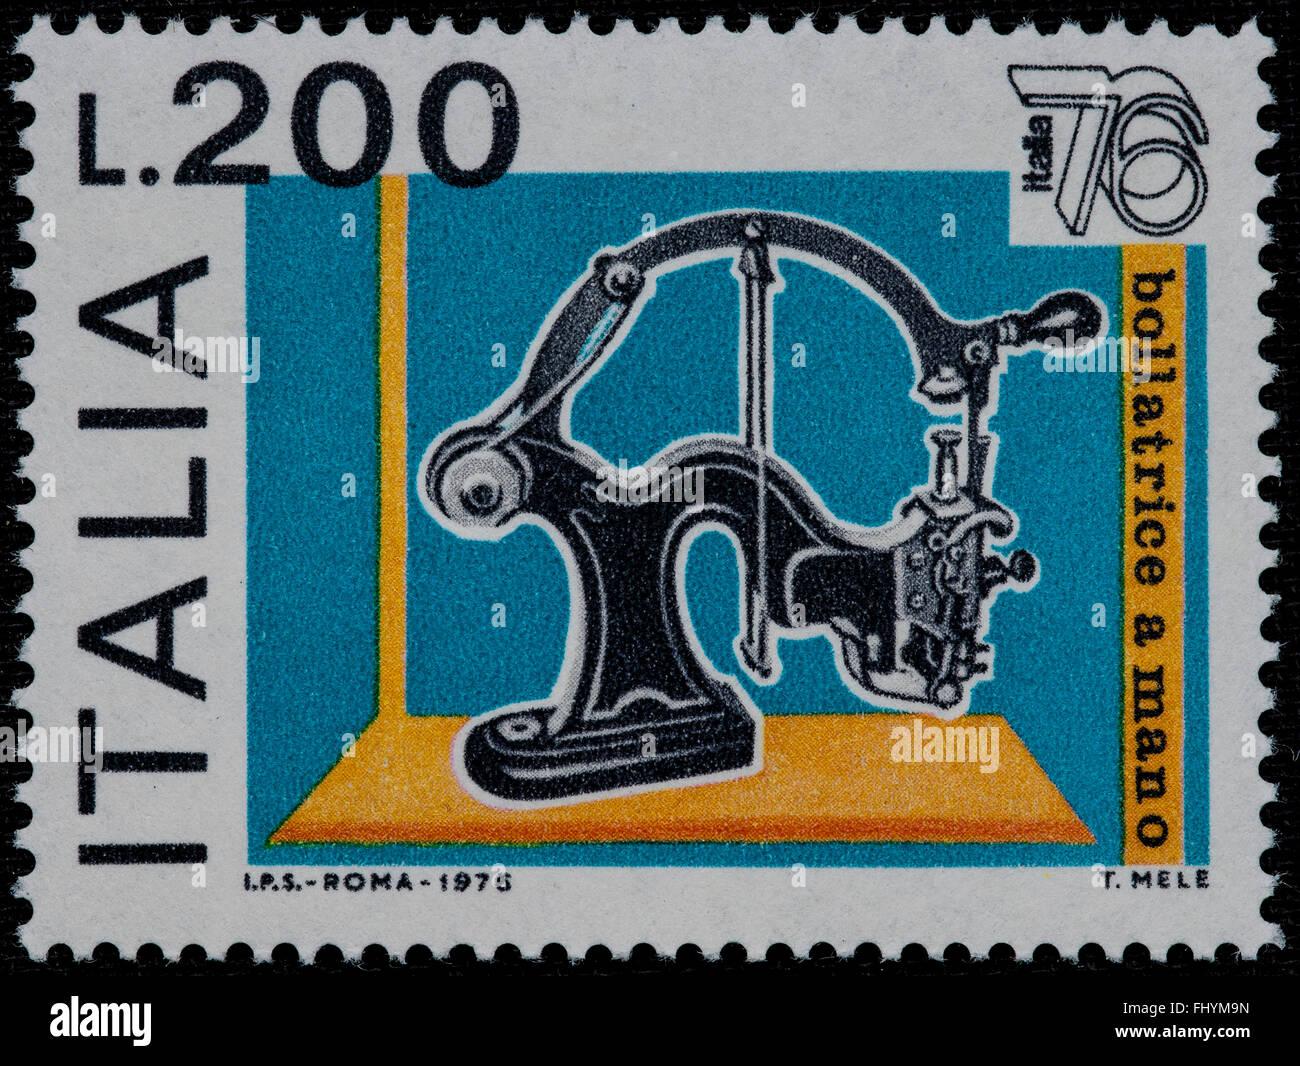 1976 Italian mint stamp issued to celebrate Italia 76 philatelic expo Lire 200 - Stock Image